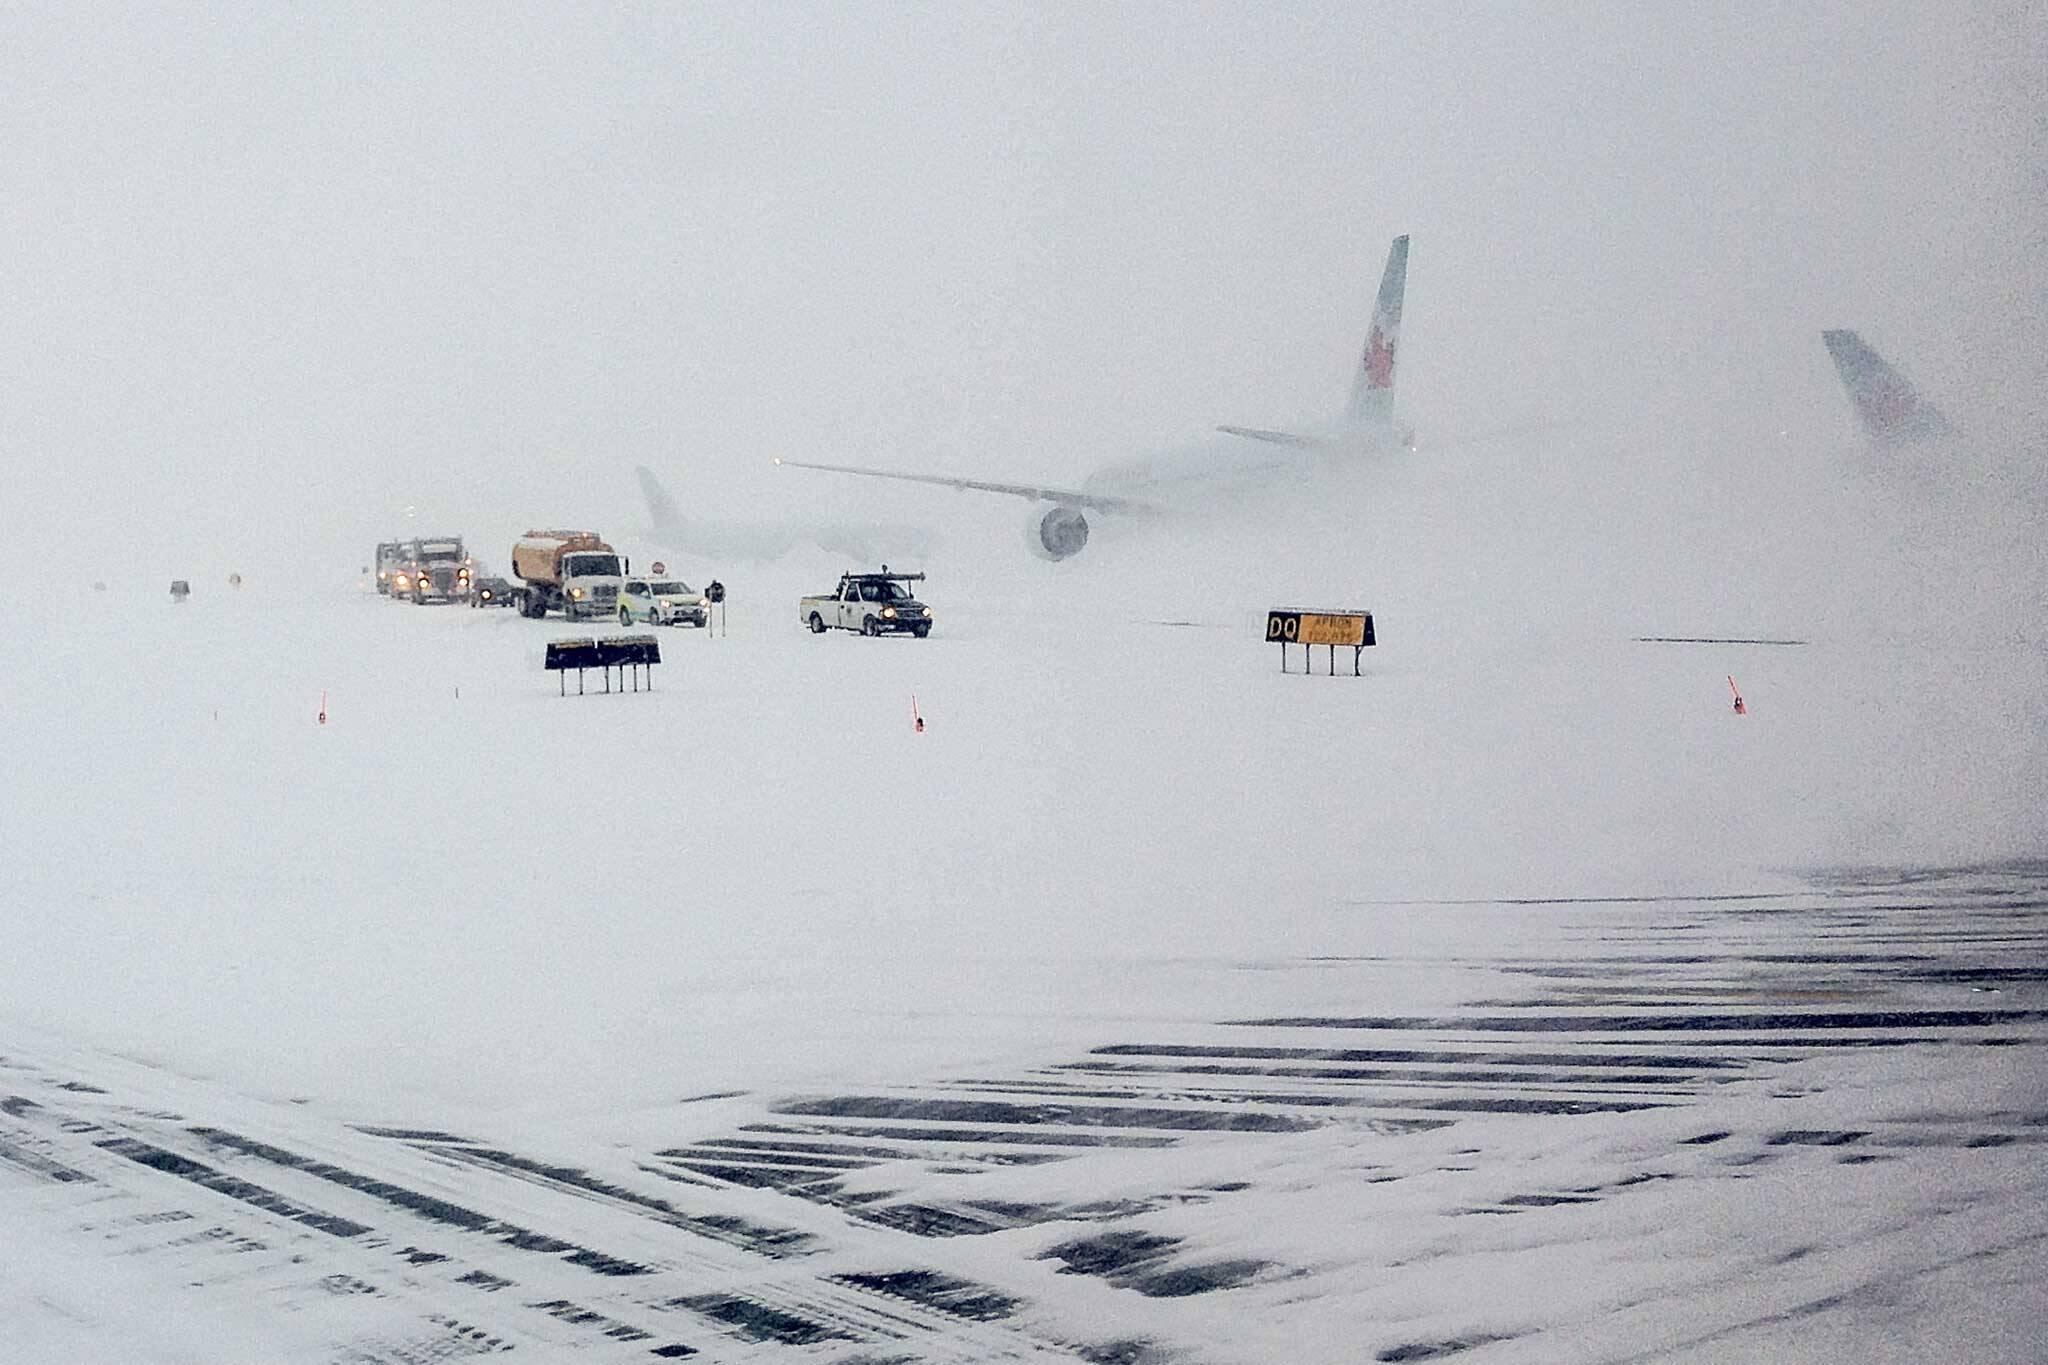 toronto flight cancellations